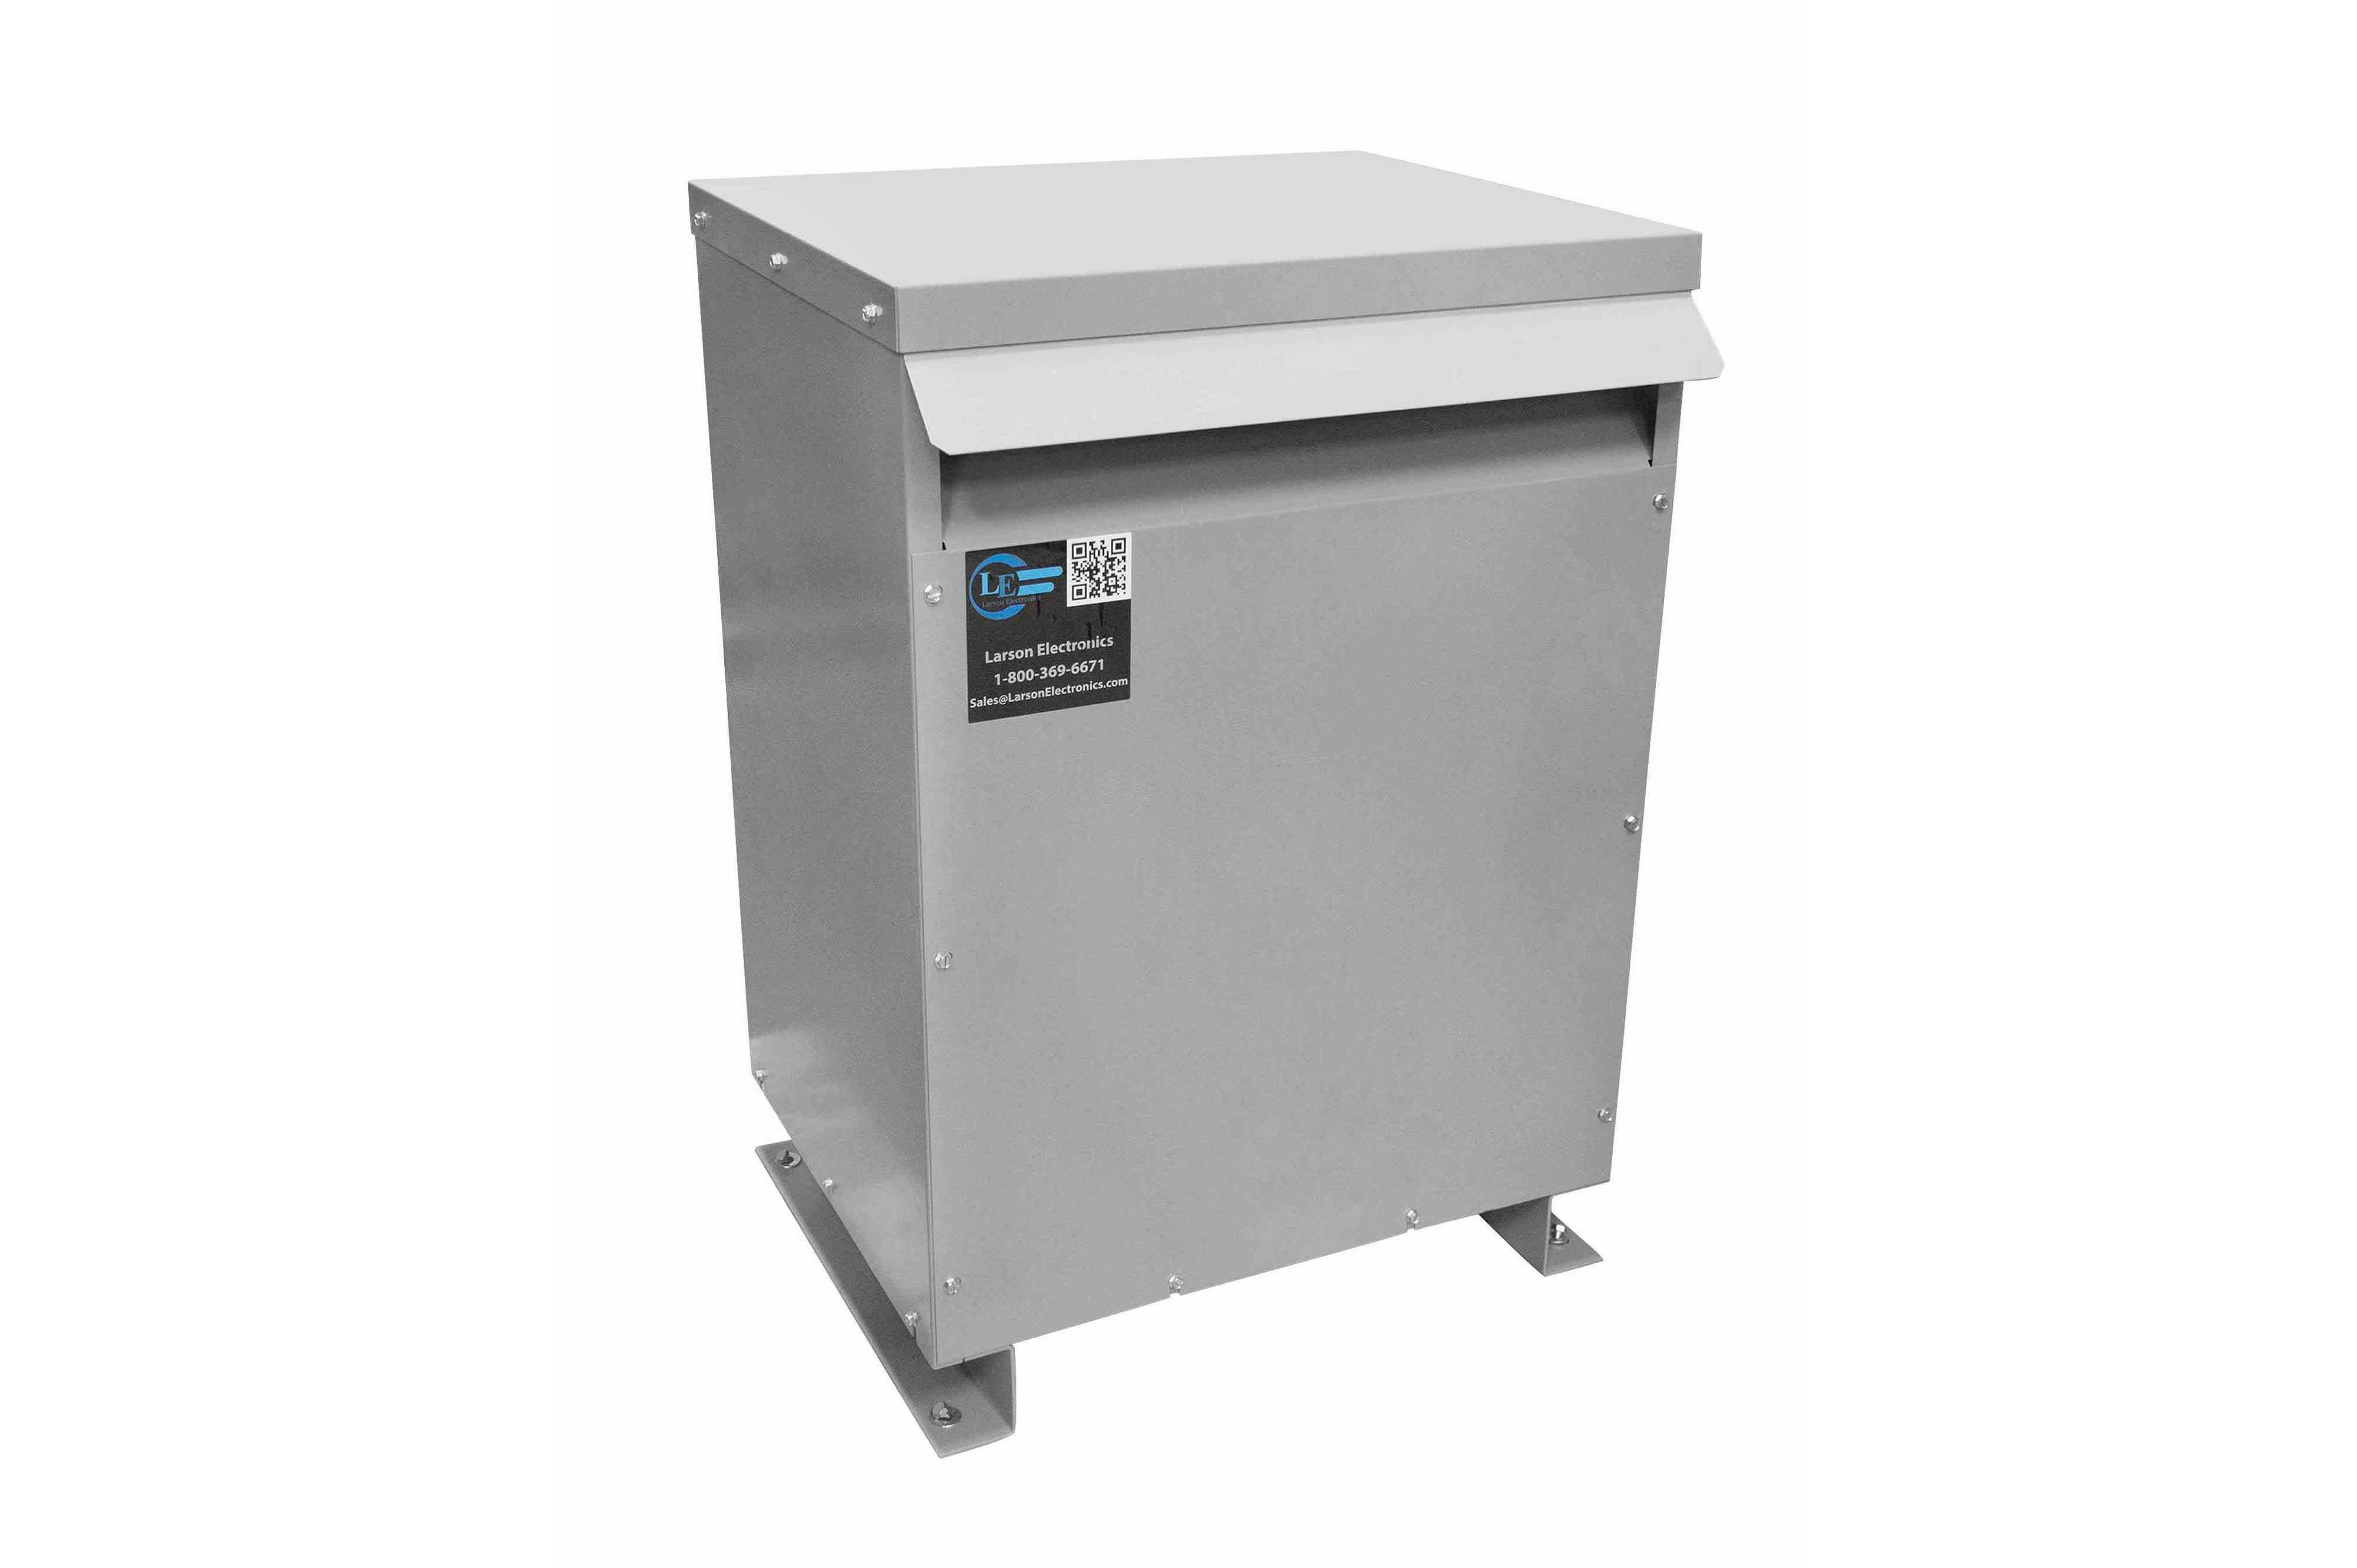 275 kVA 3PH Isolation Transformer, 240V Wye Primary, 380V Delta Secondary, N3R, Ventilated, 60 Hz